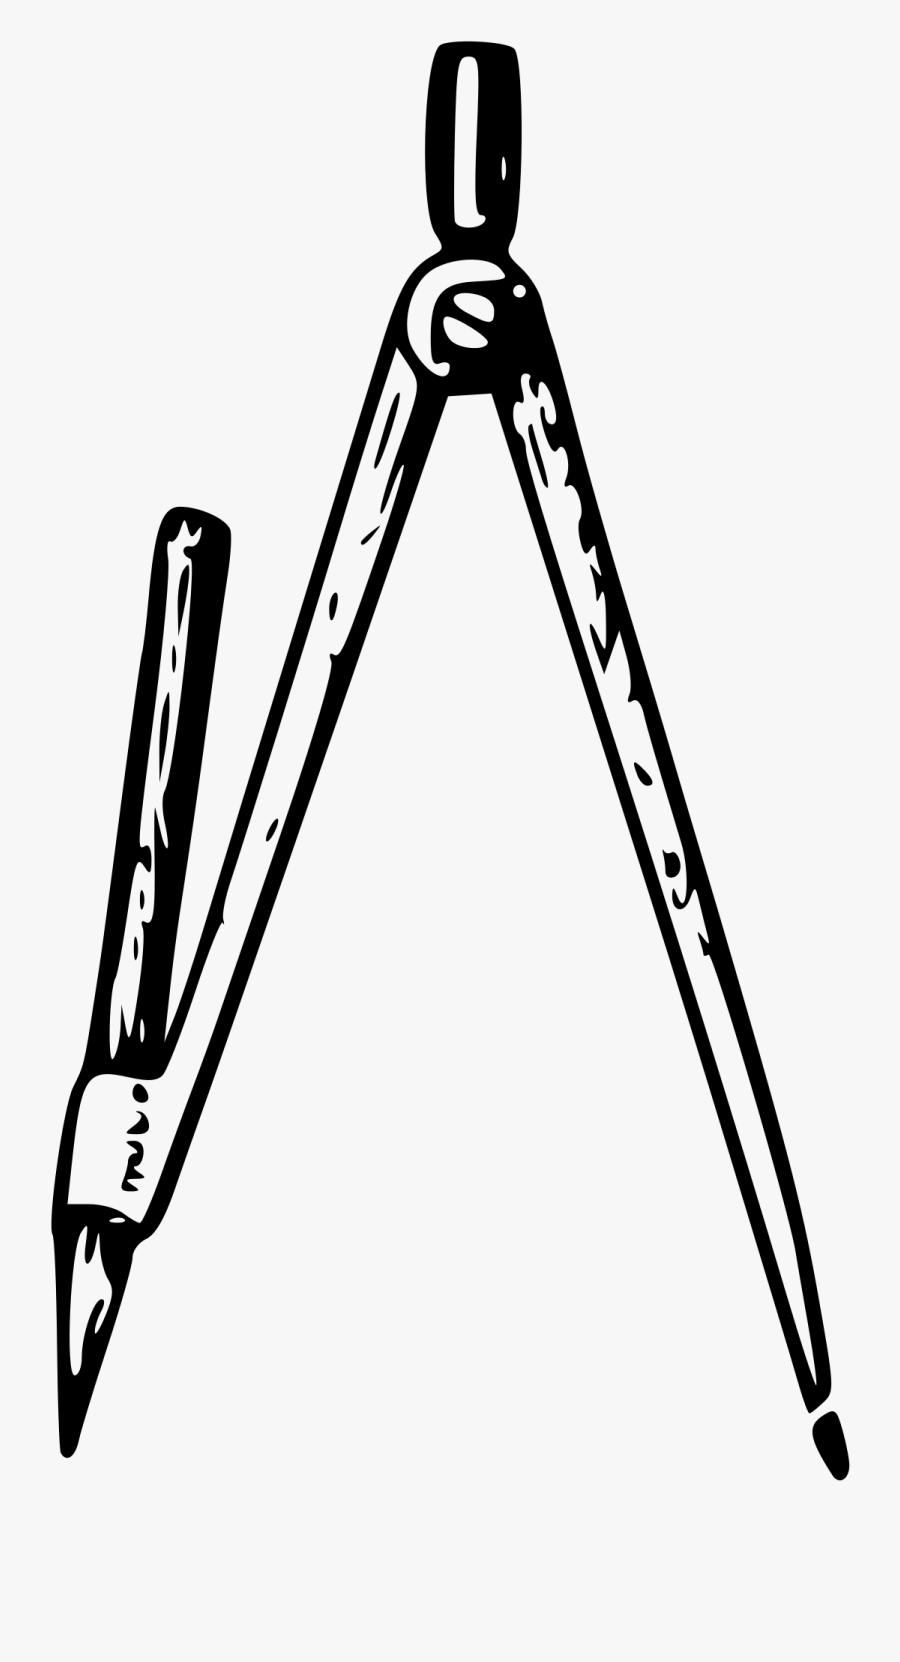 Lutz Big Image Png - Drawing Compass Clip Art, Transparent Clipart